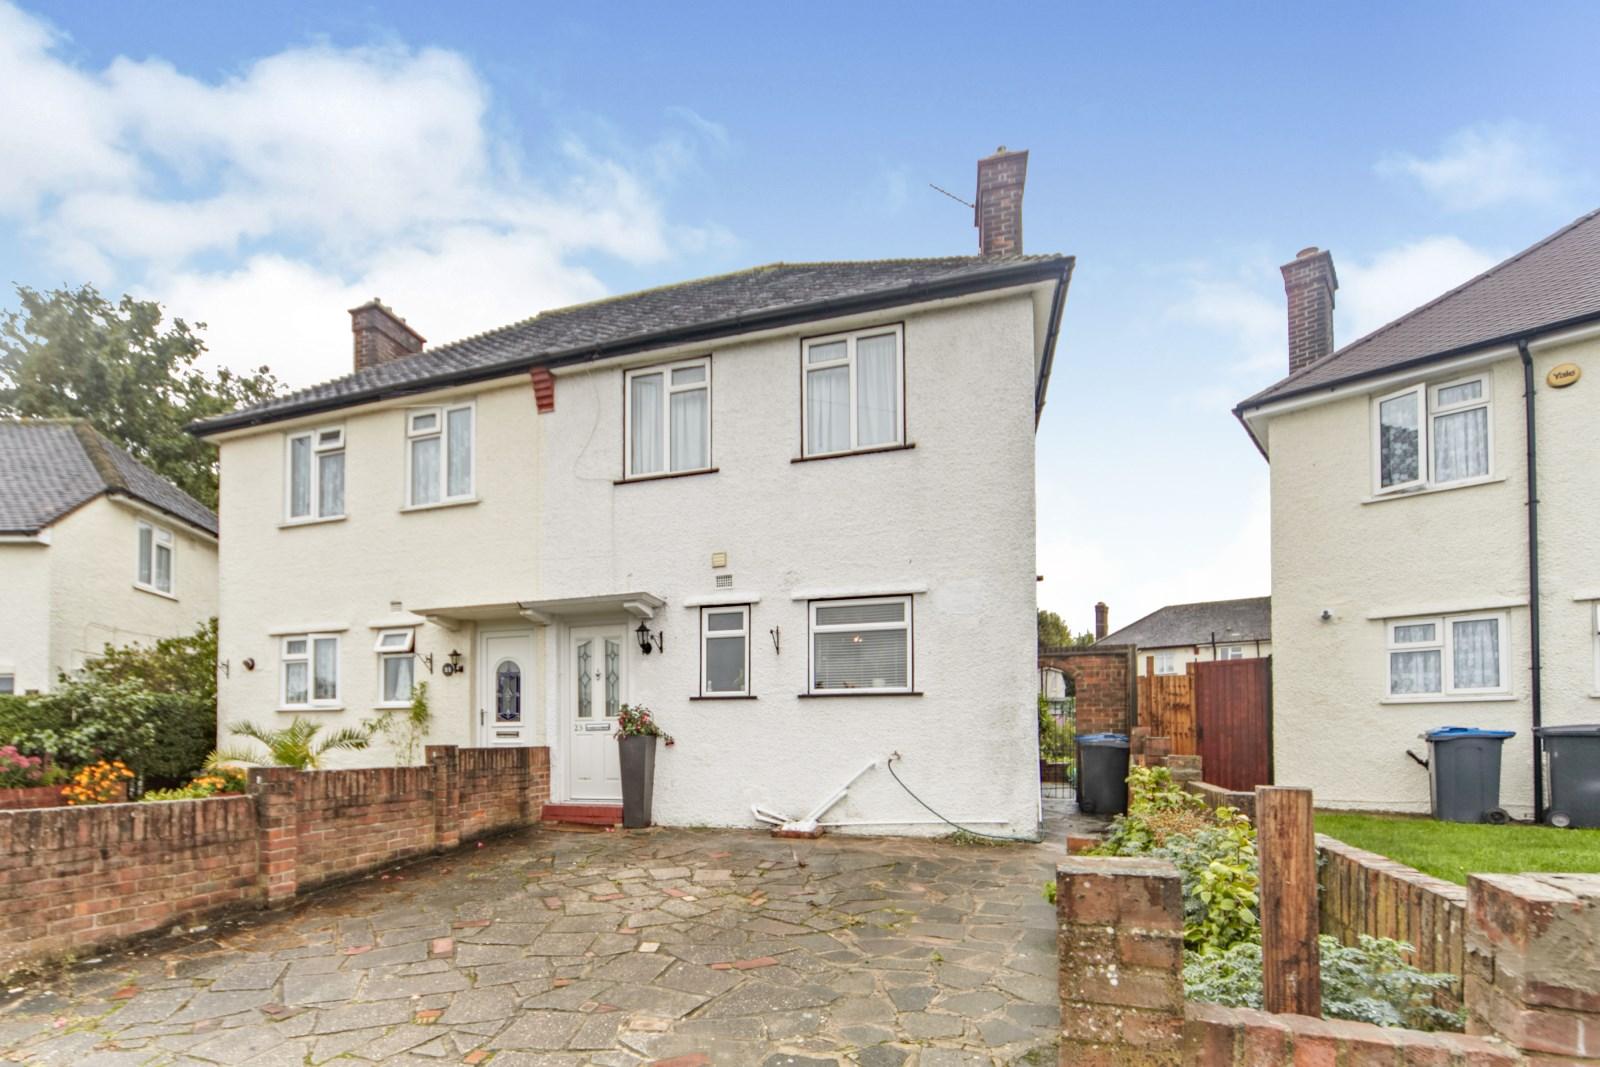 Houlder Crescent, Wadddon, Croydon, Surrey, CR0